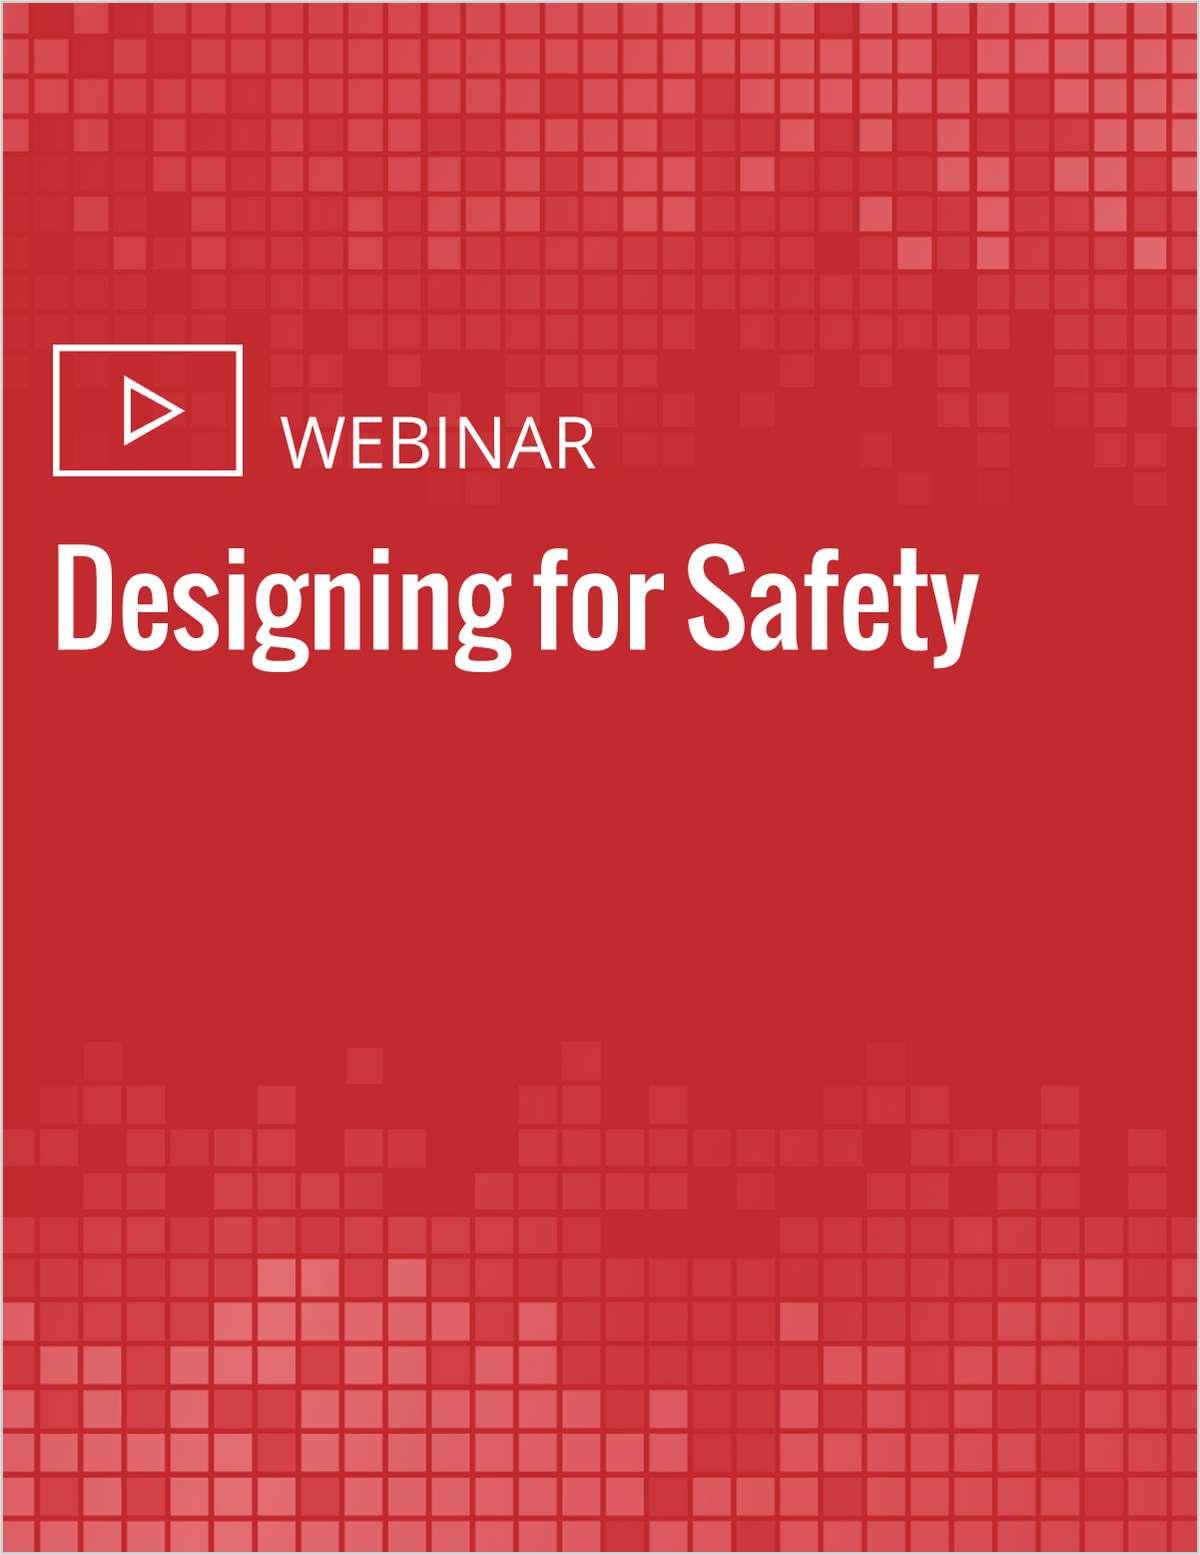 Designing for Safety